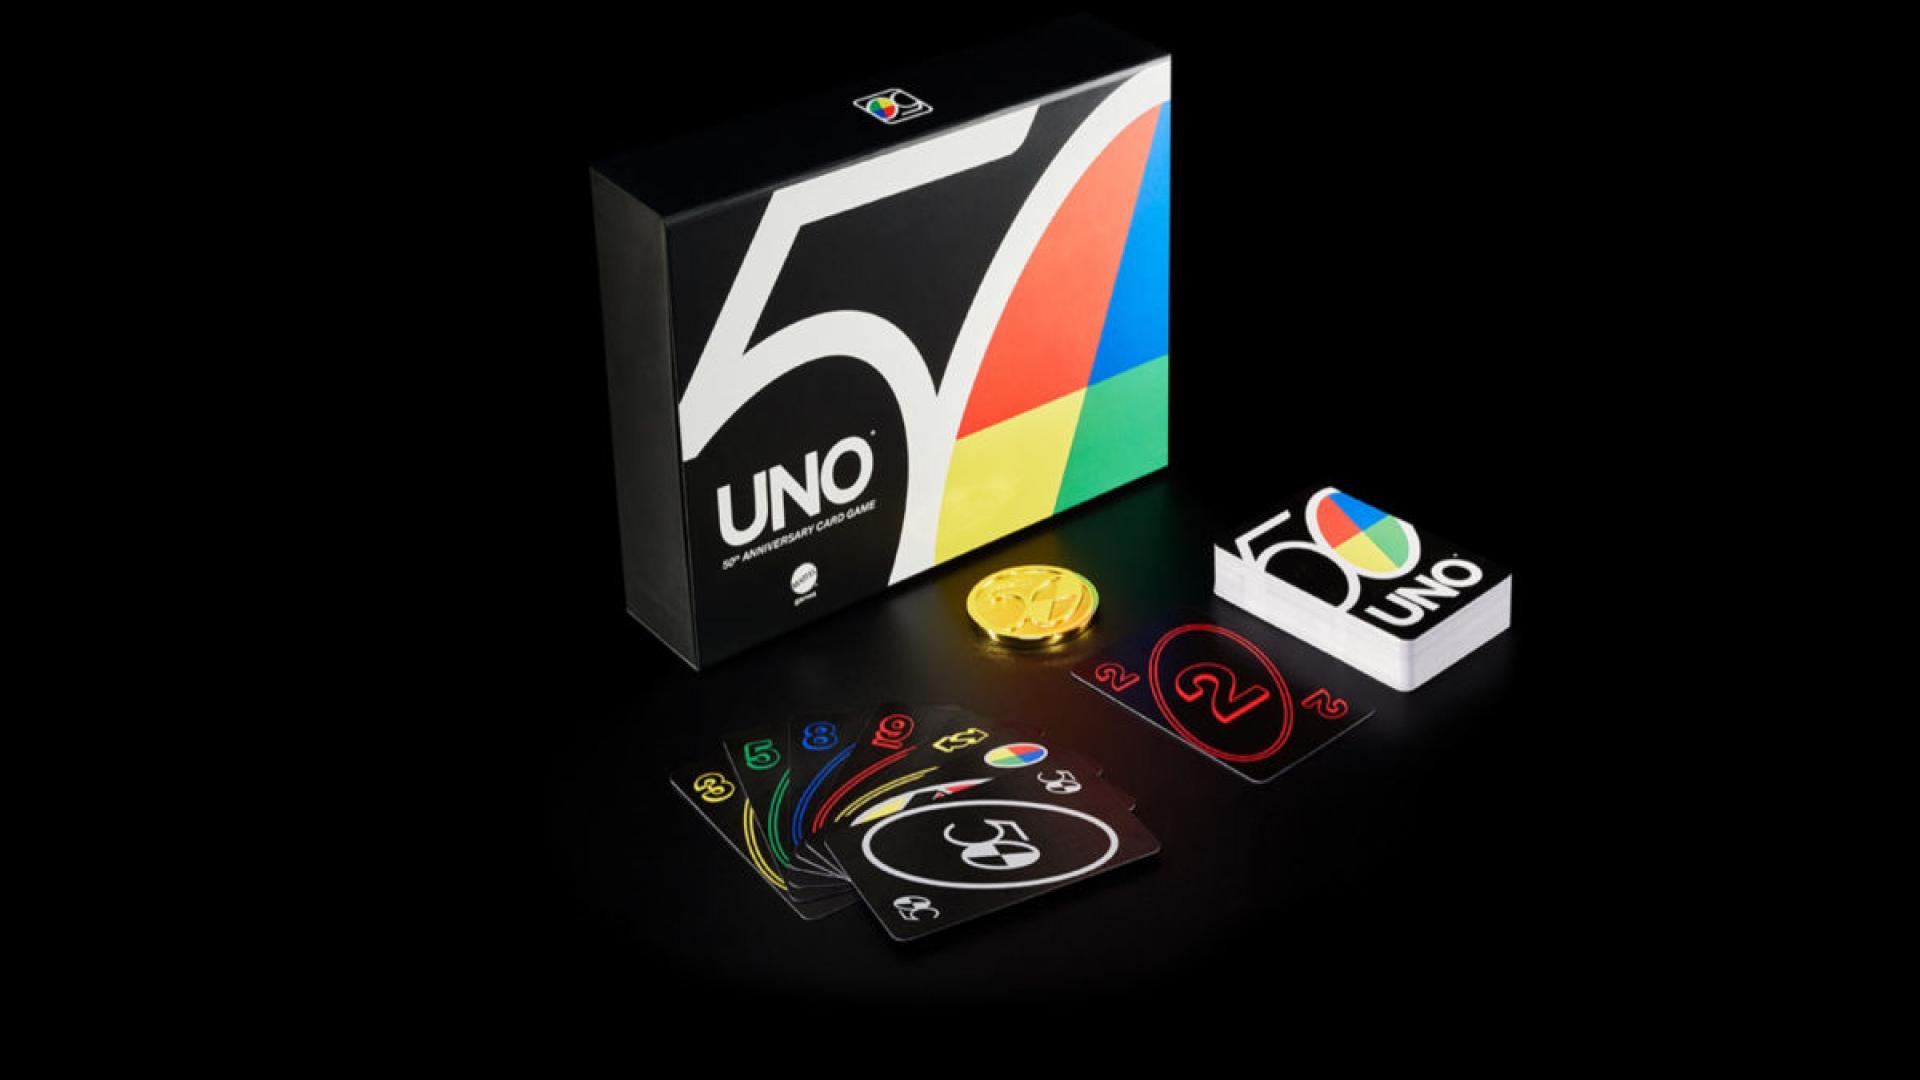 uno-50-full-box.png